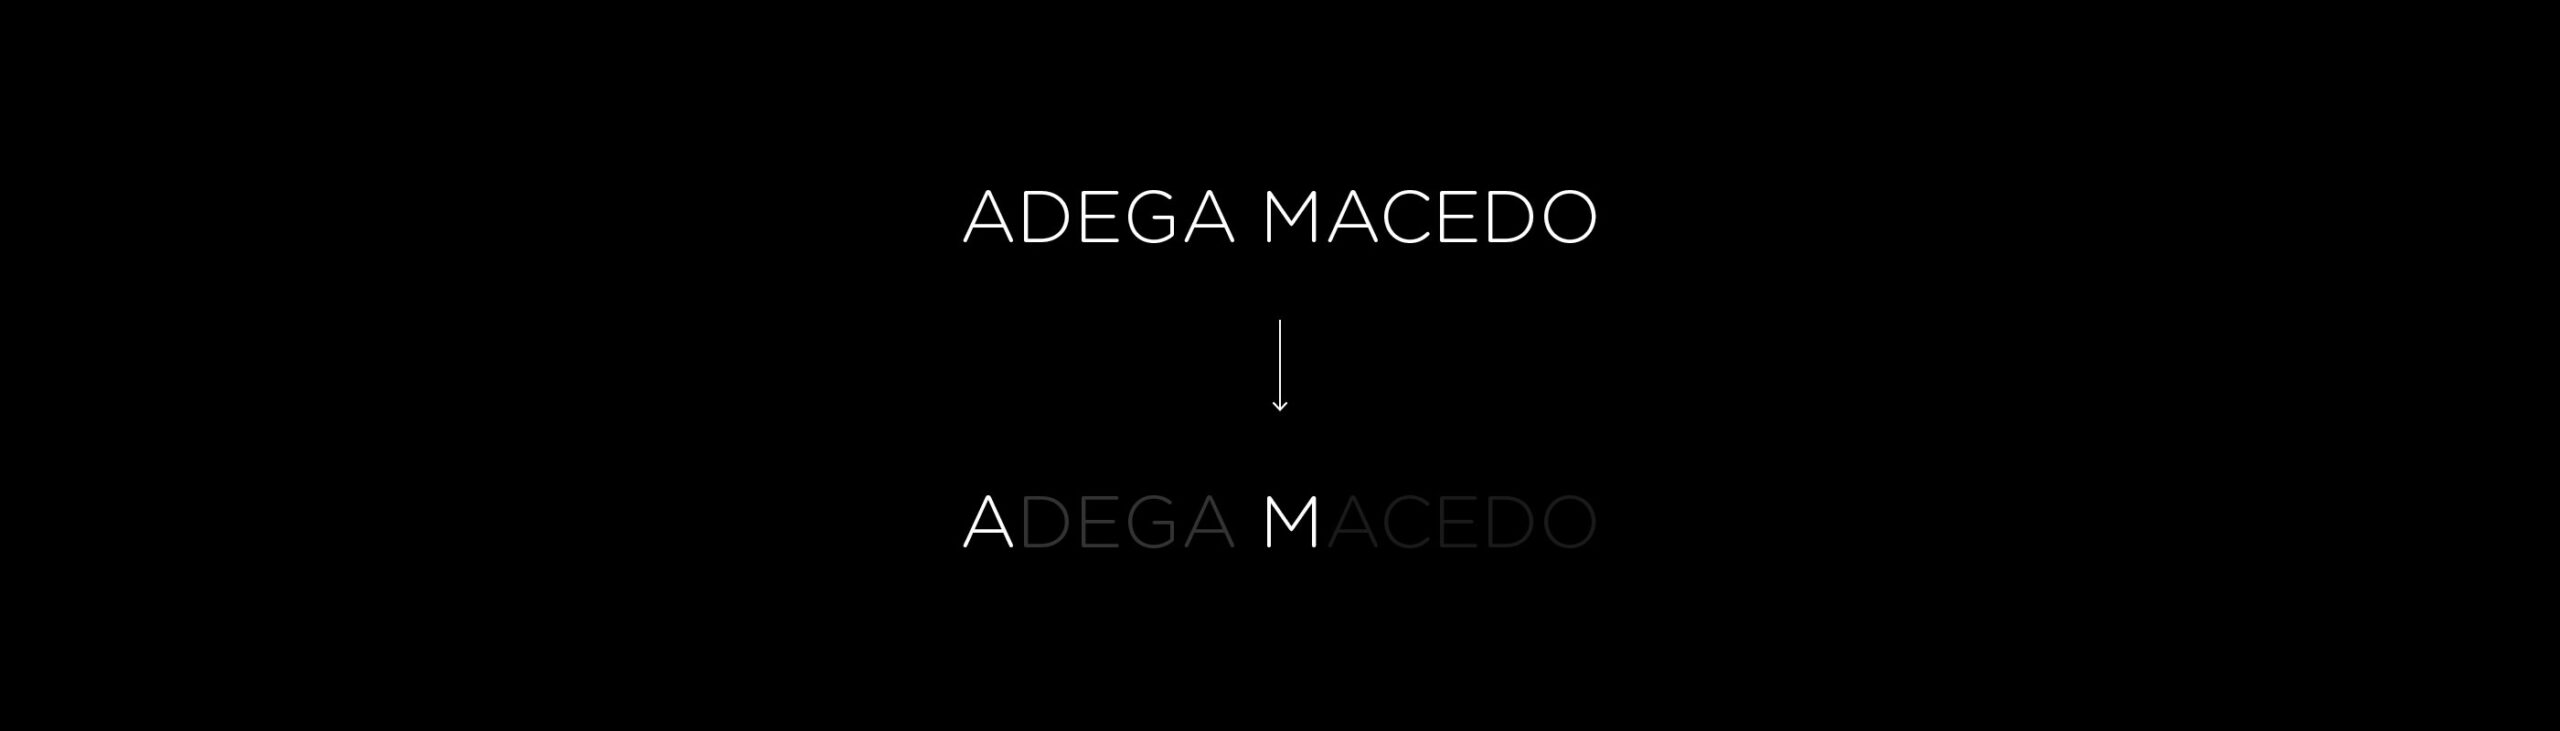 adega_macedo_002_1